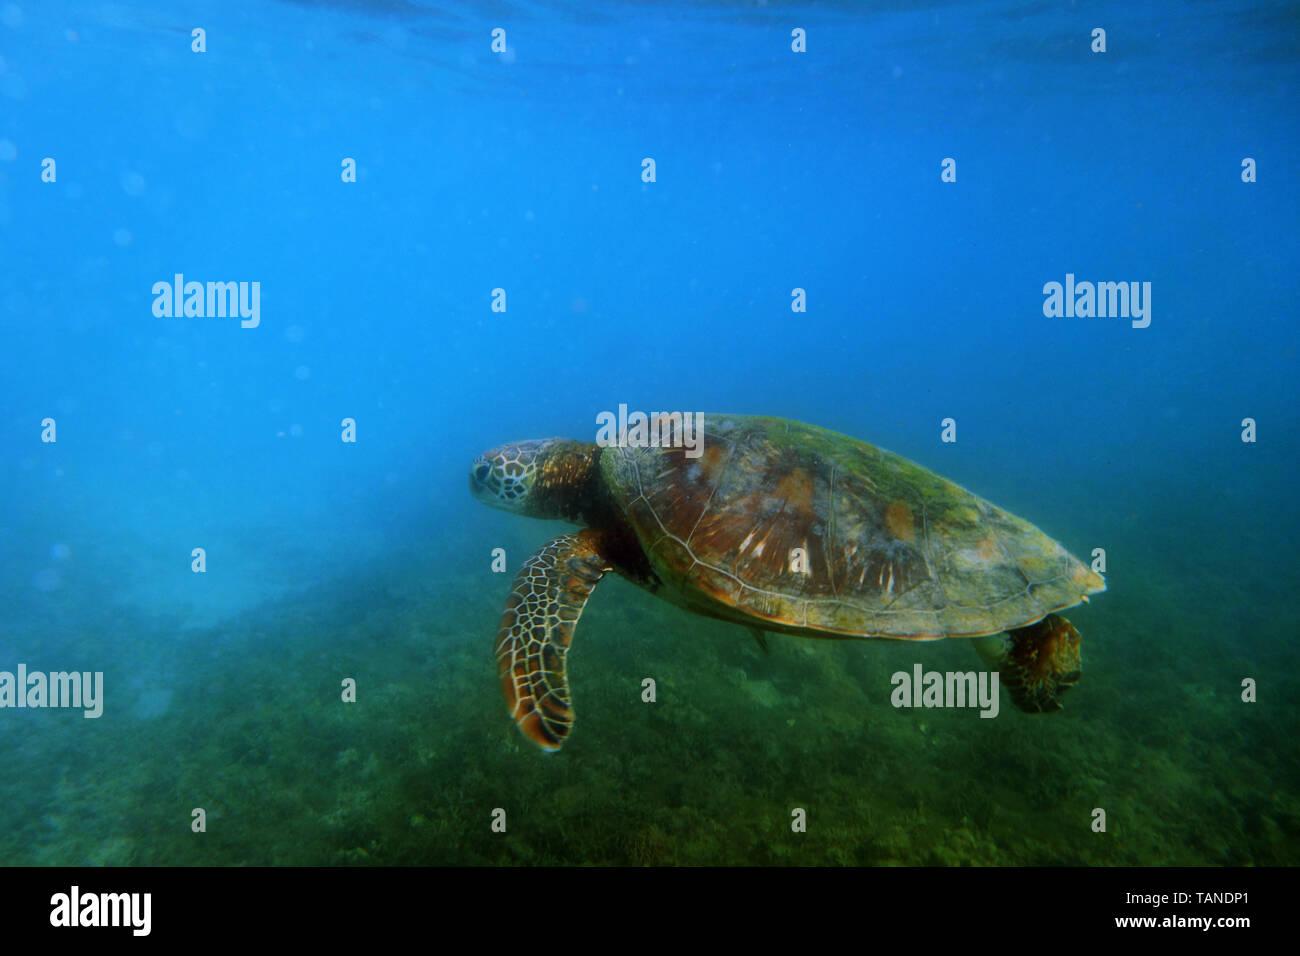 Green turtle (Chelonia mydas), near Fitzroy Island, Great Barrier Reef, near Cairns, Queensland, Australia - Stock Image